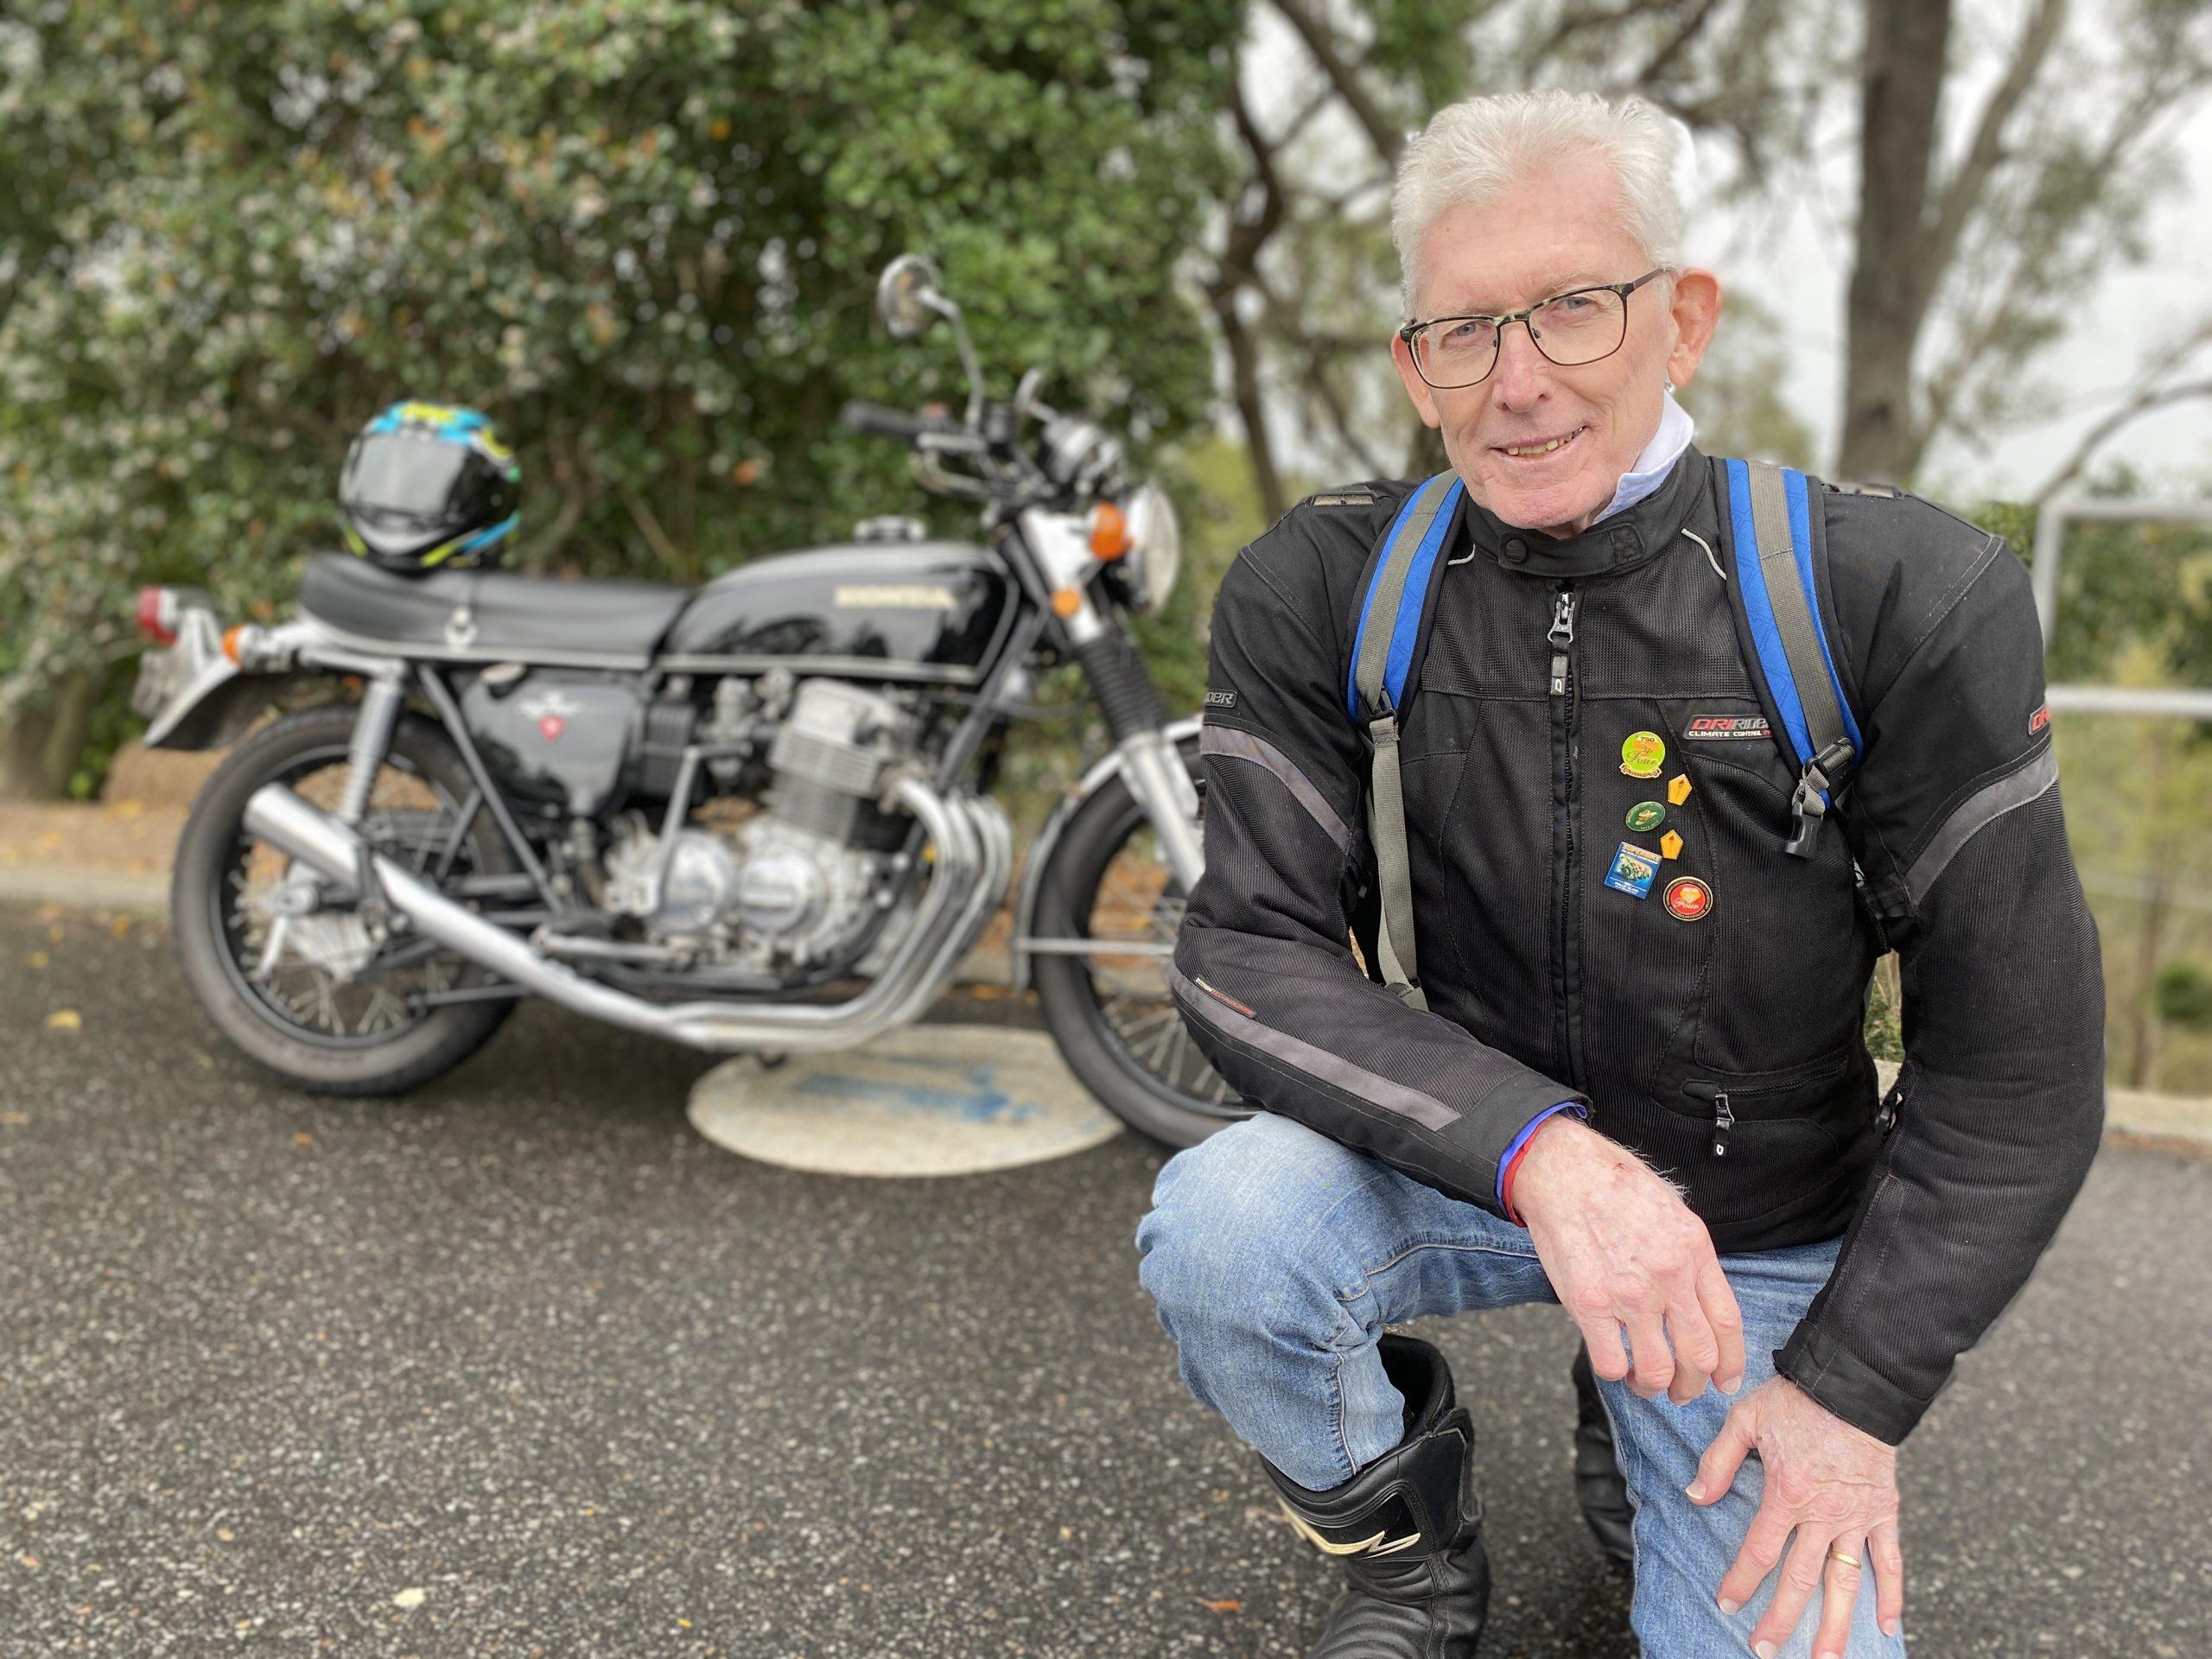 Queensland Motorcycle Council president Graham Keys